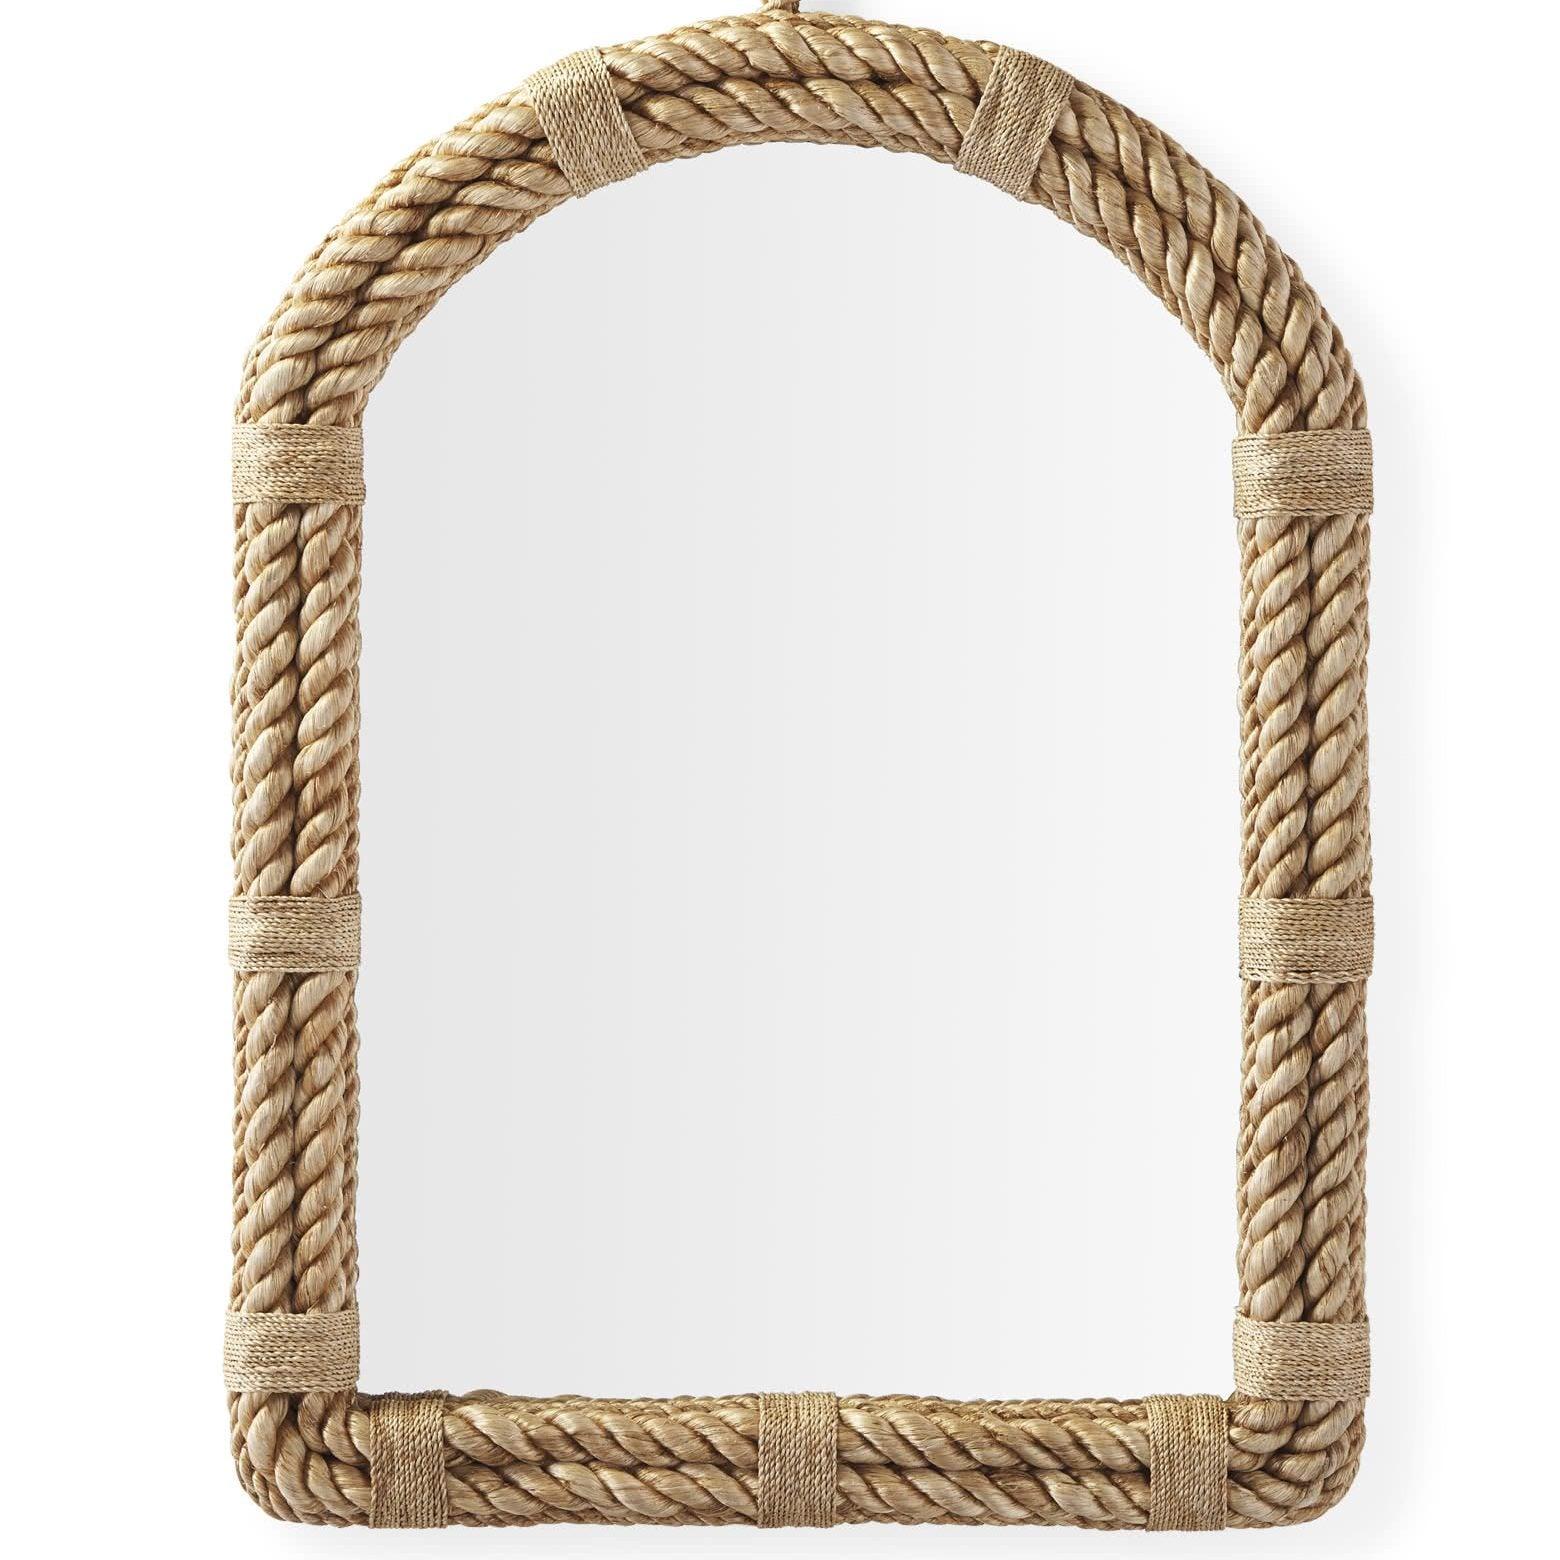 Mirror_Nautical_Arched_Rope_Natural_MV_Crop_SH